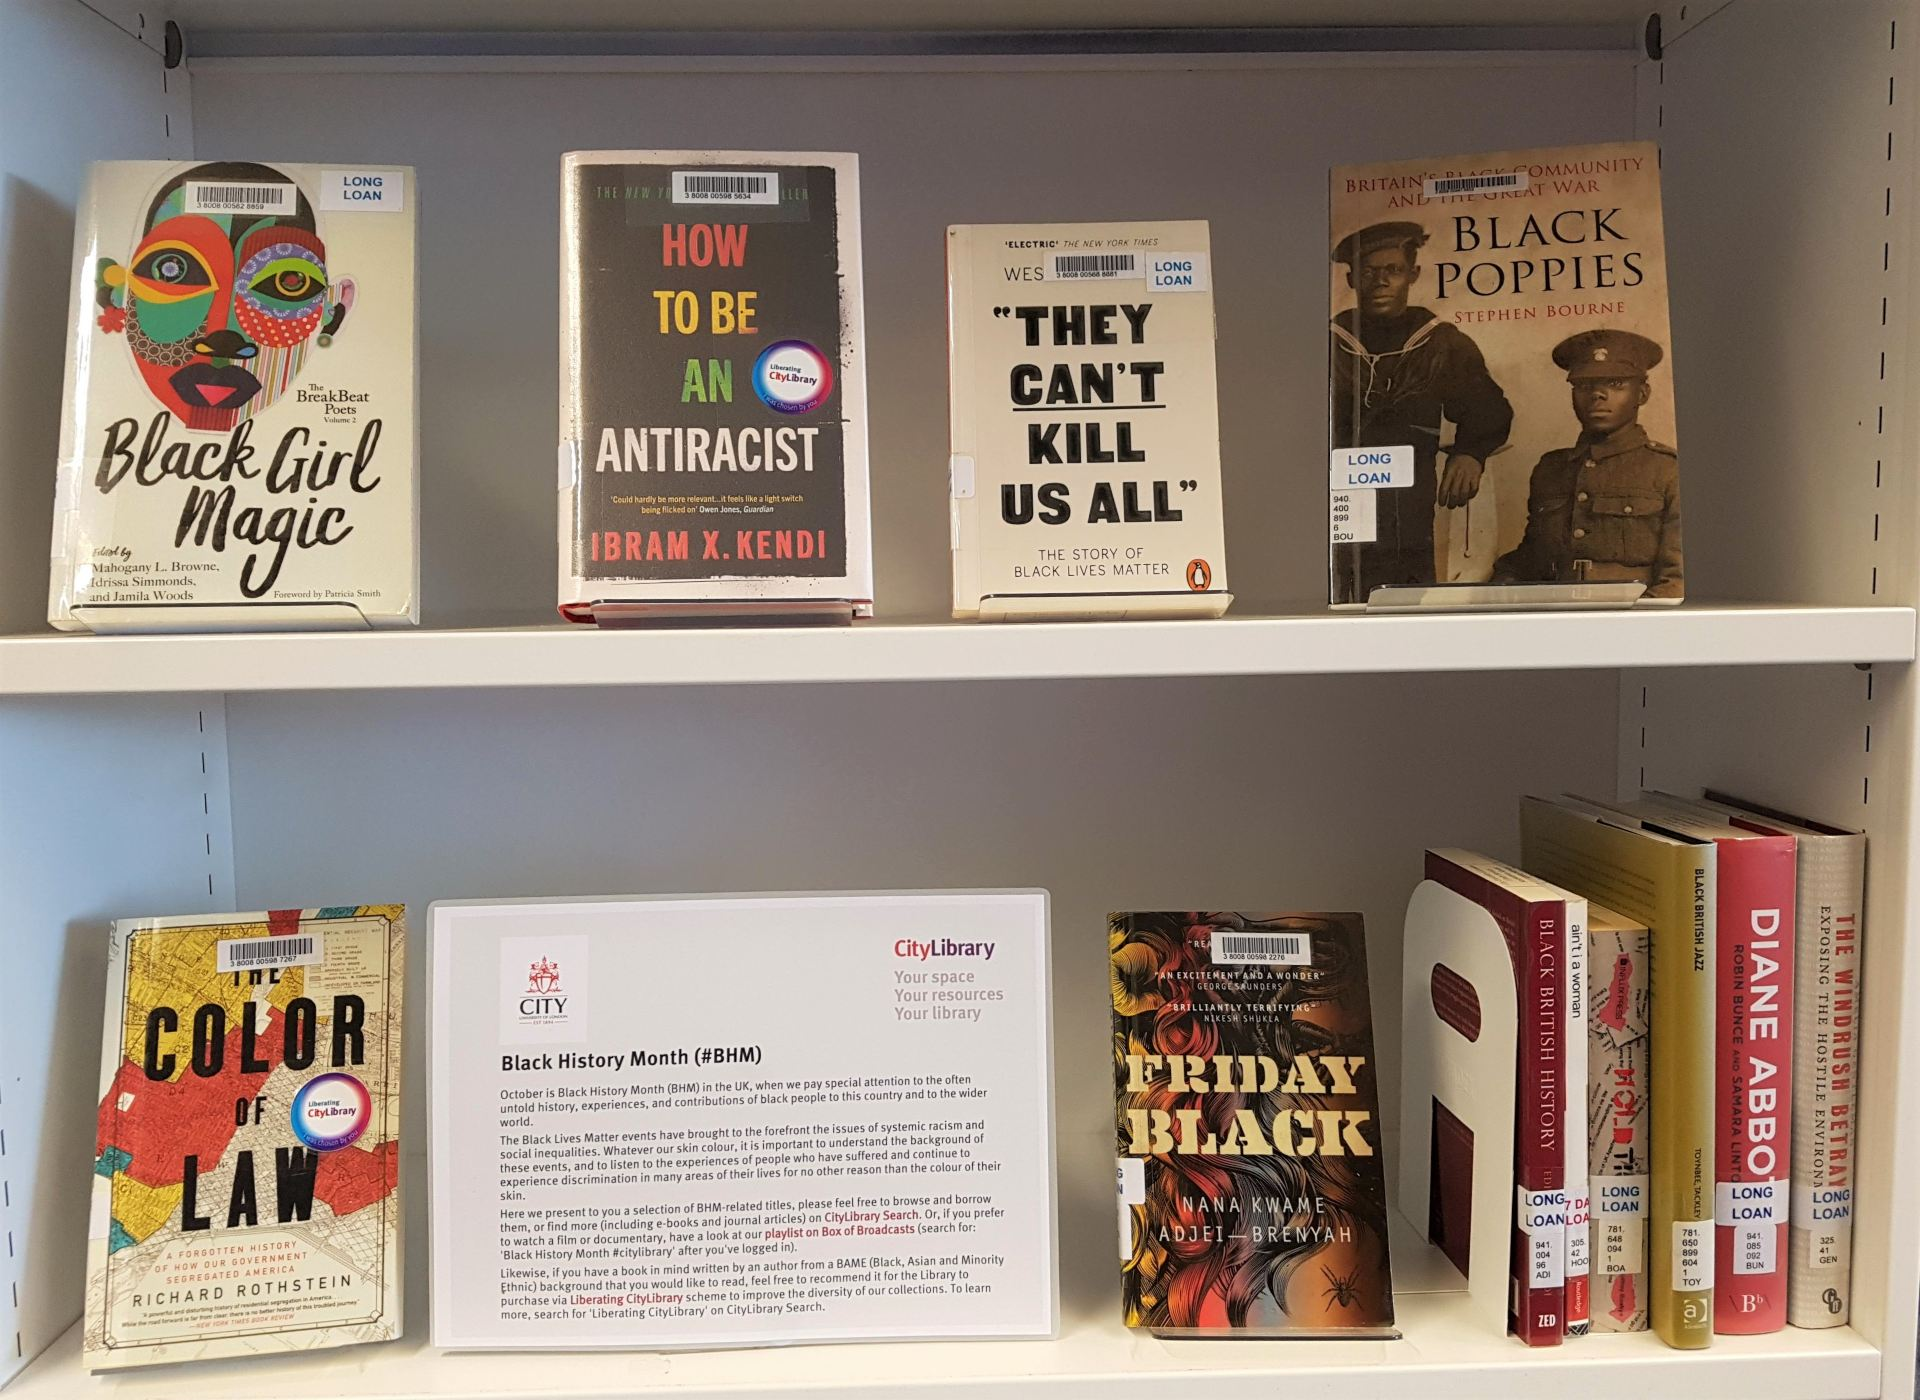 Black History Month book display at Northampton Square Library